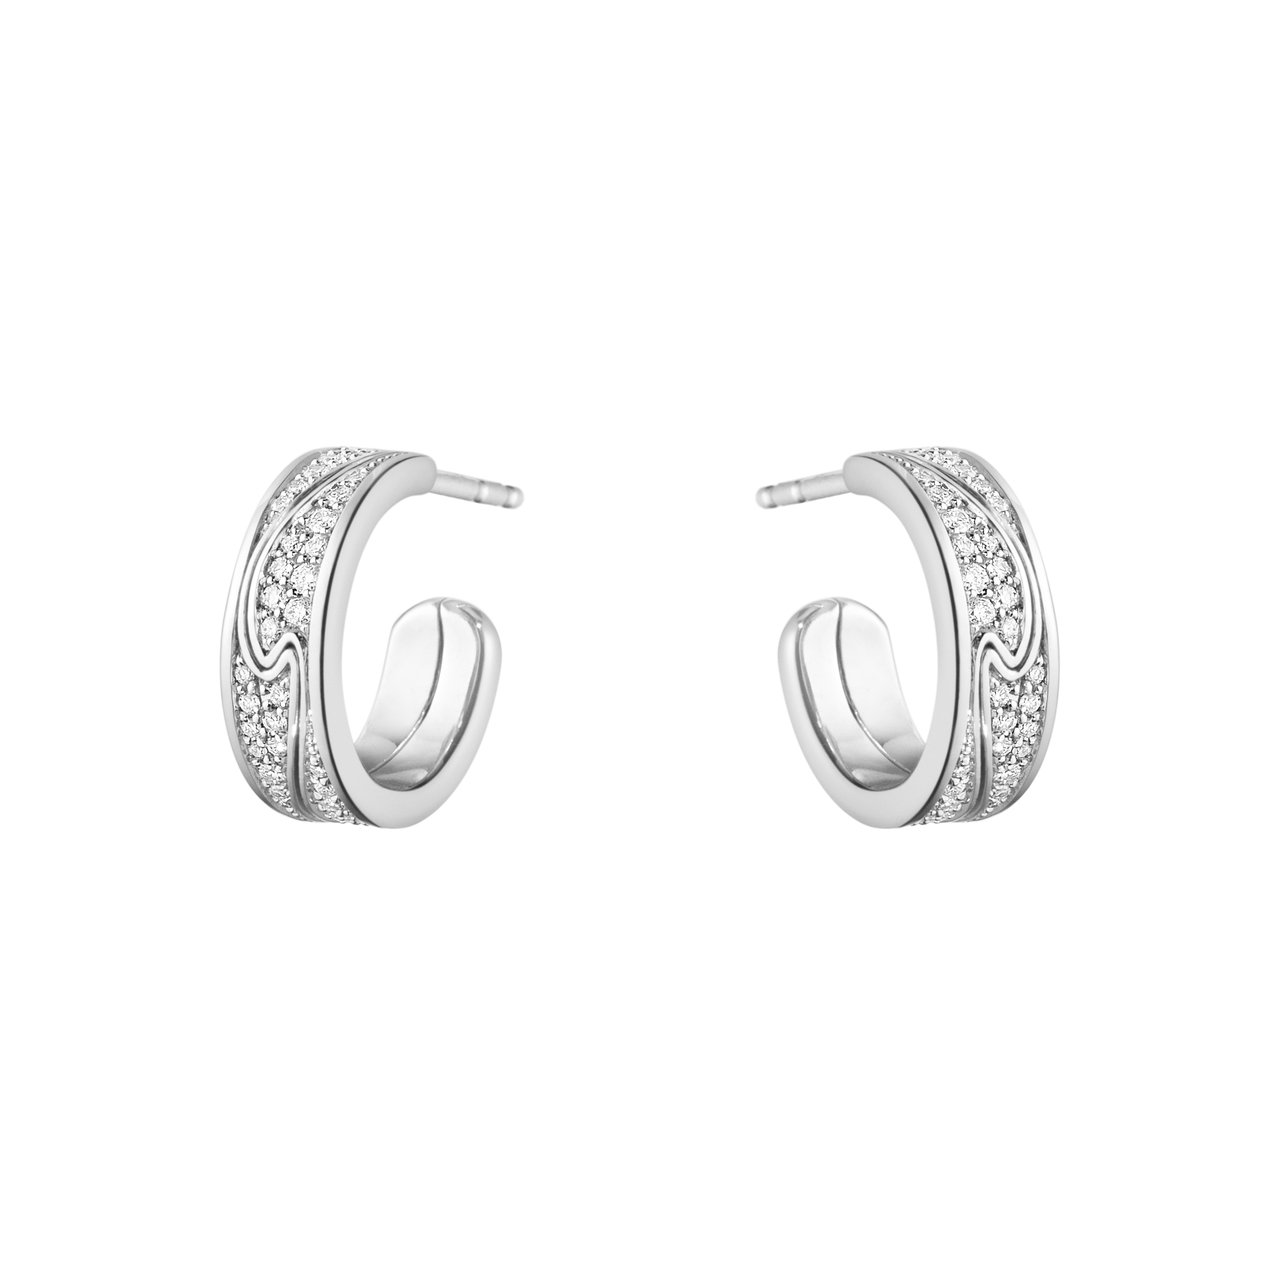 GEORG JENSEN NEW FUSION系列18K白金鋪鑲鑽石耳環,87,...